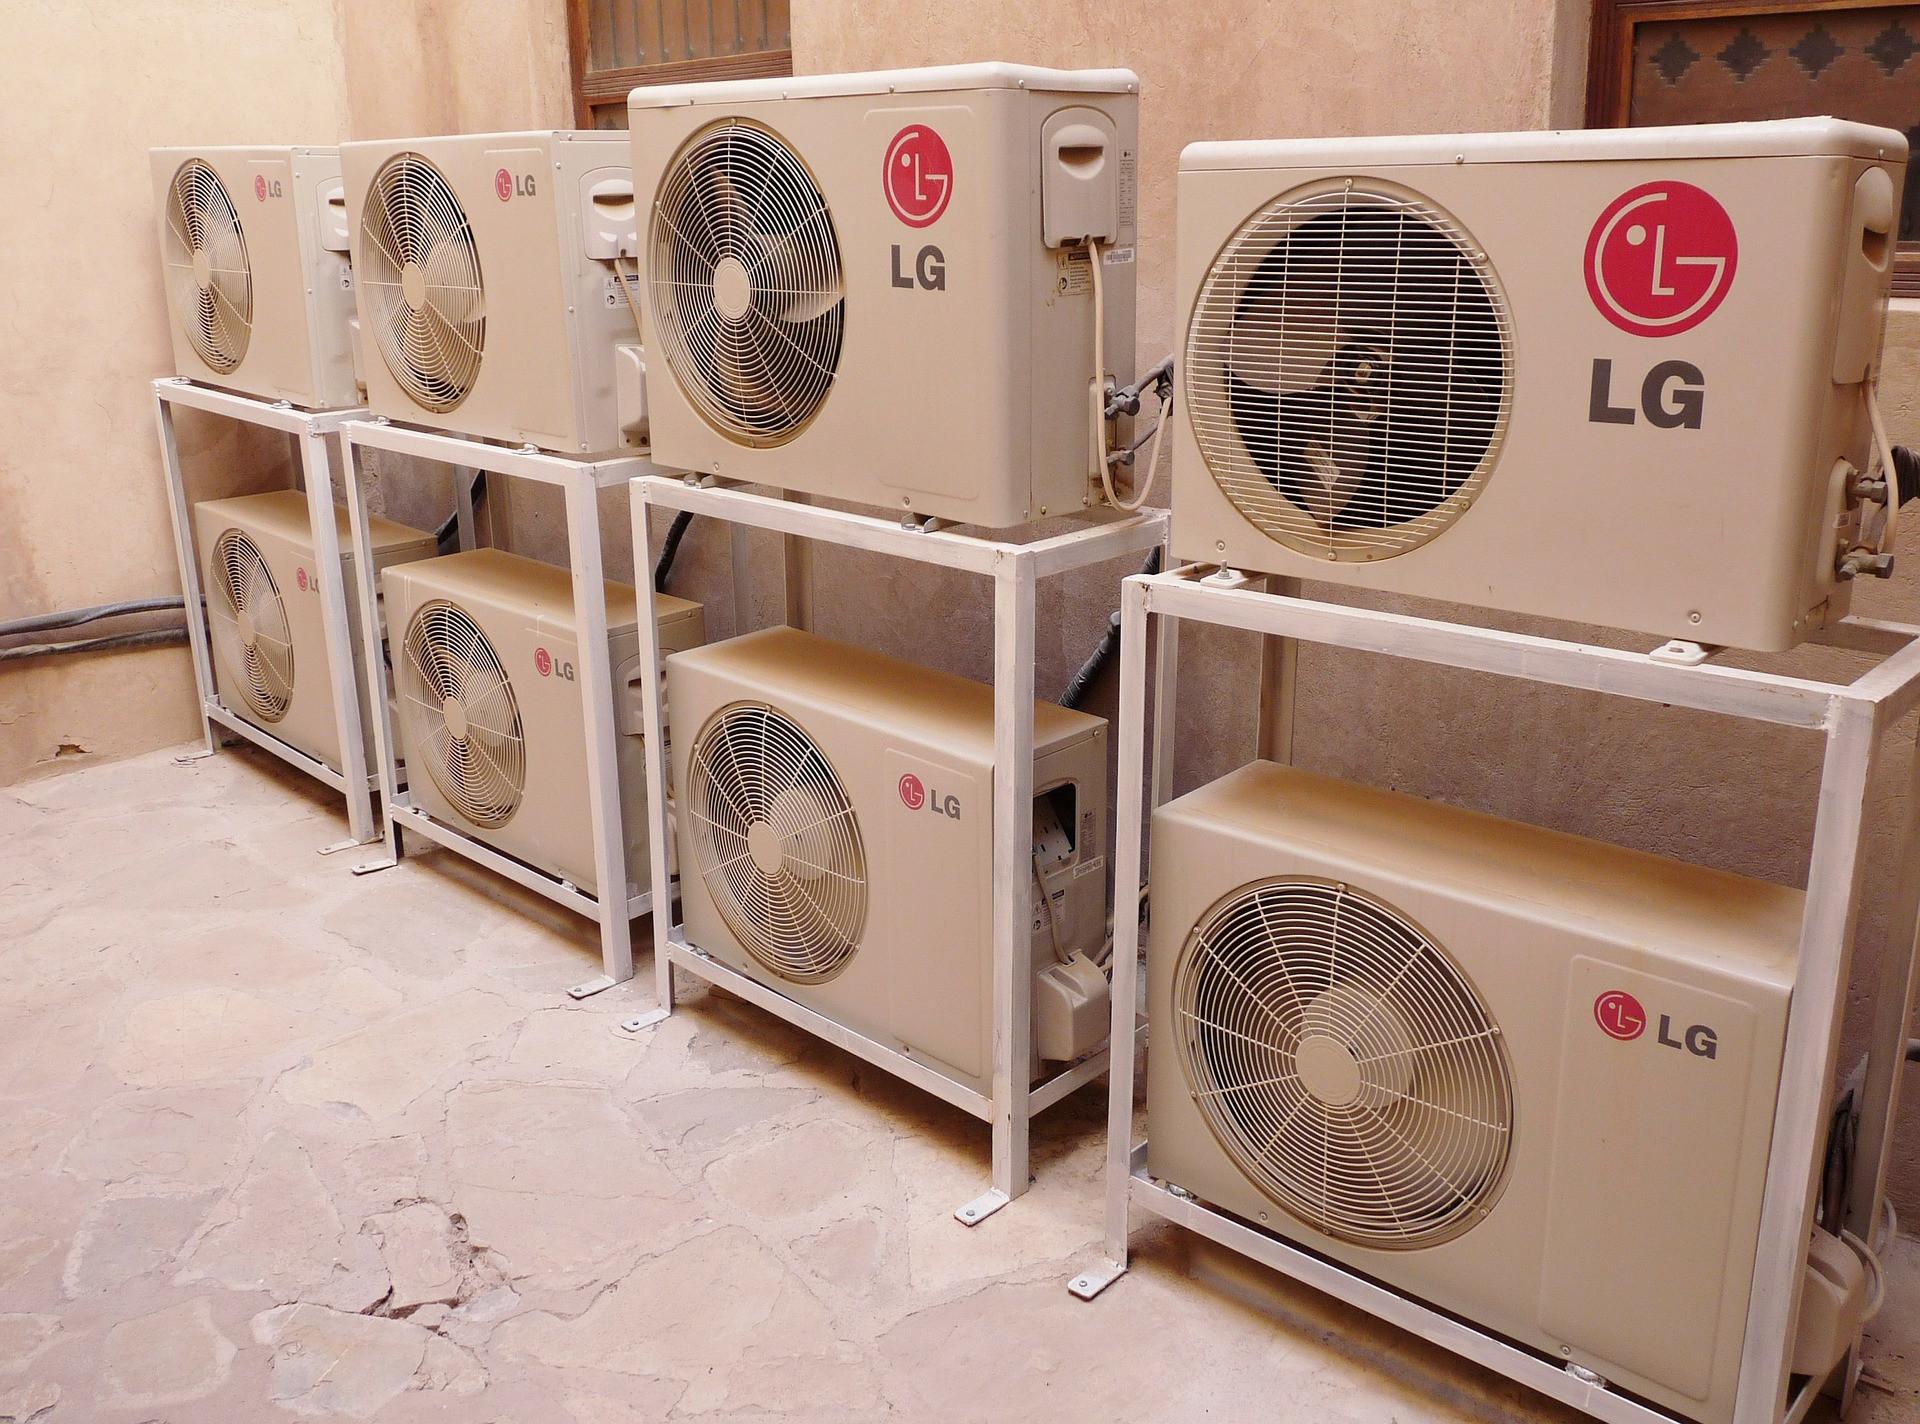 3 Tips Merawat AC Agar Mendinginkan Rumah Lebih Baik - JPNN.com